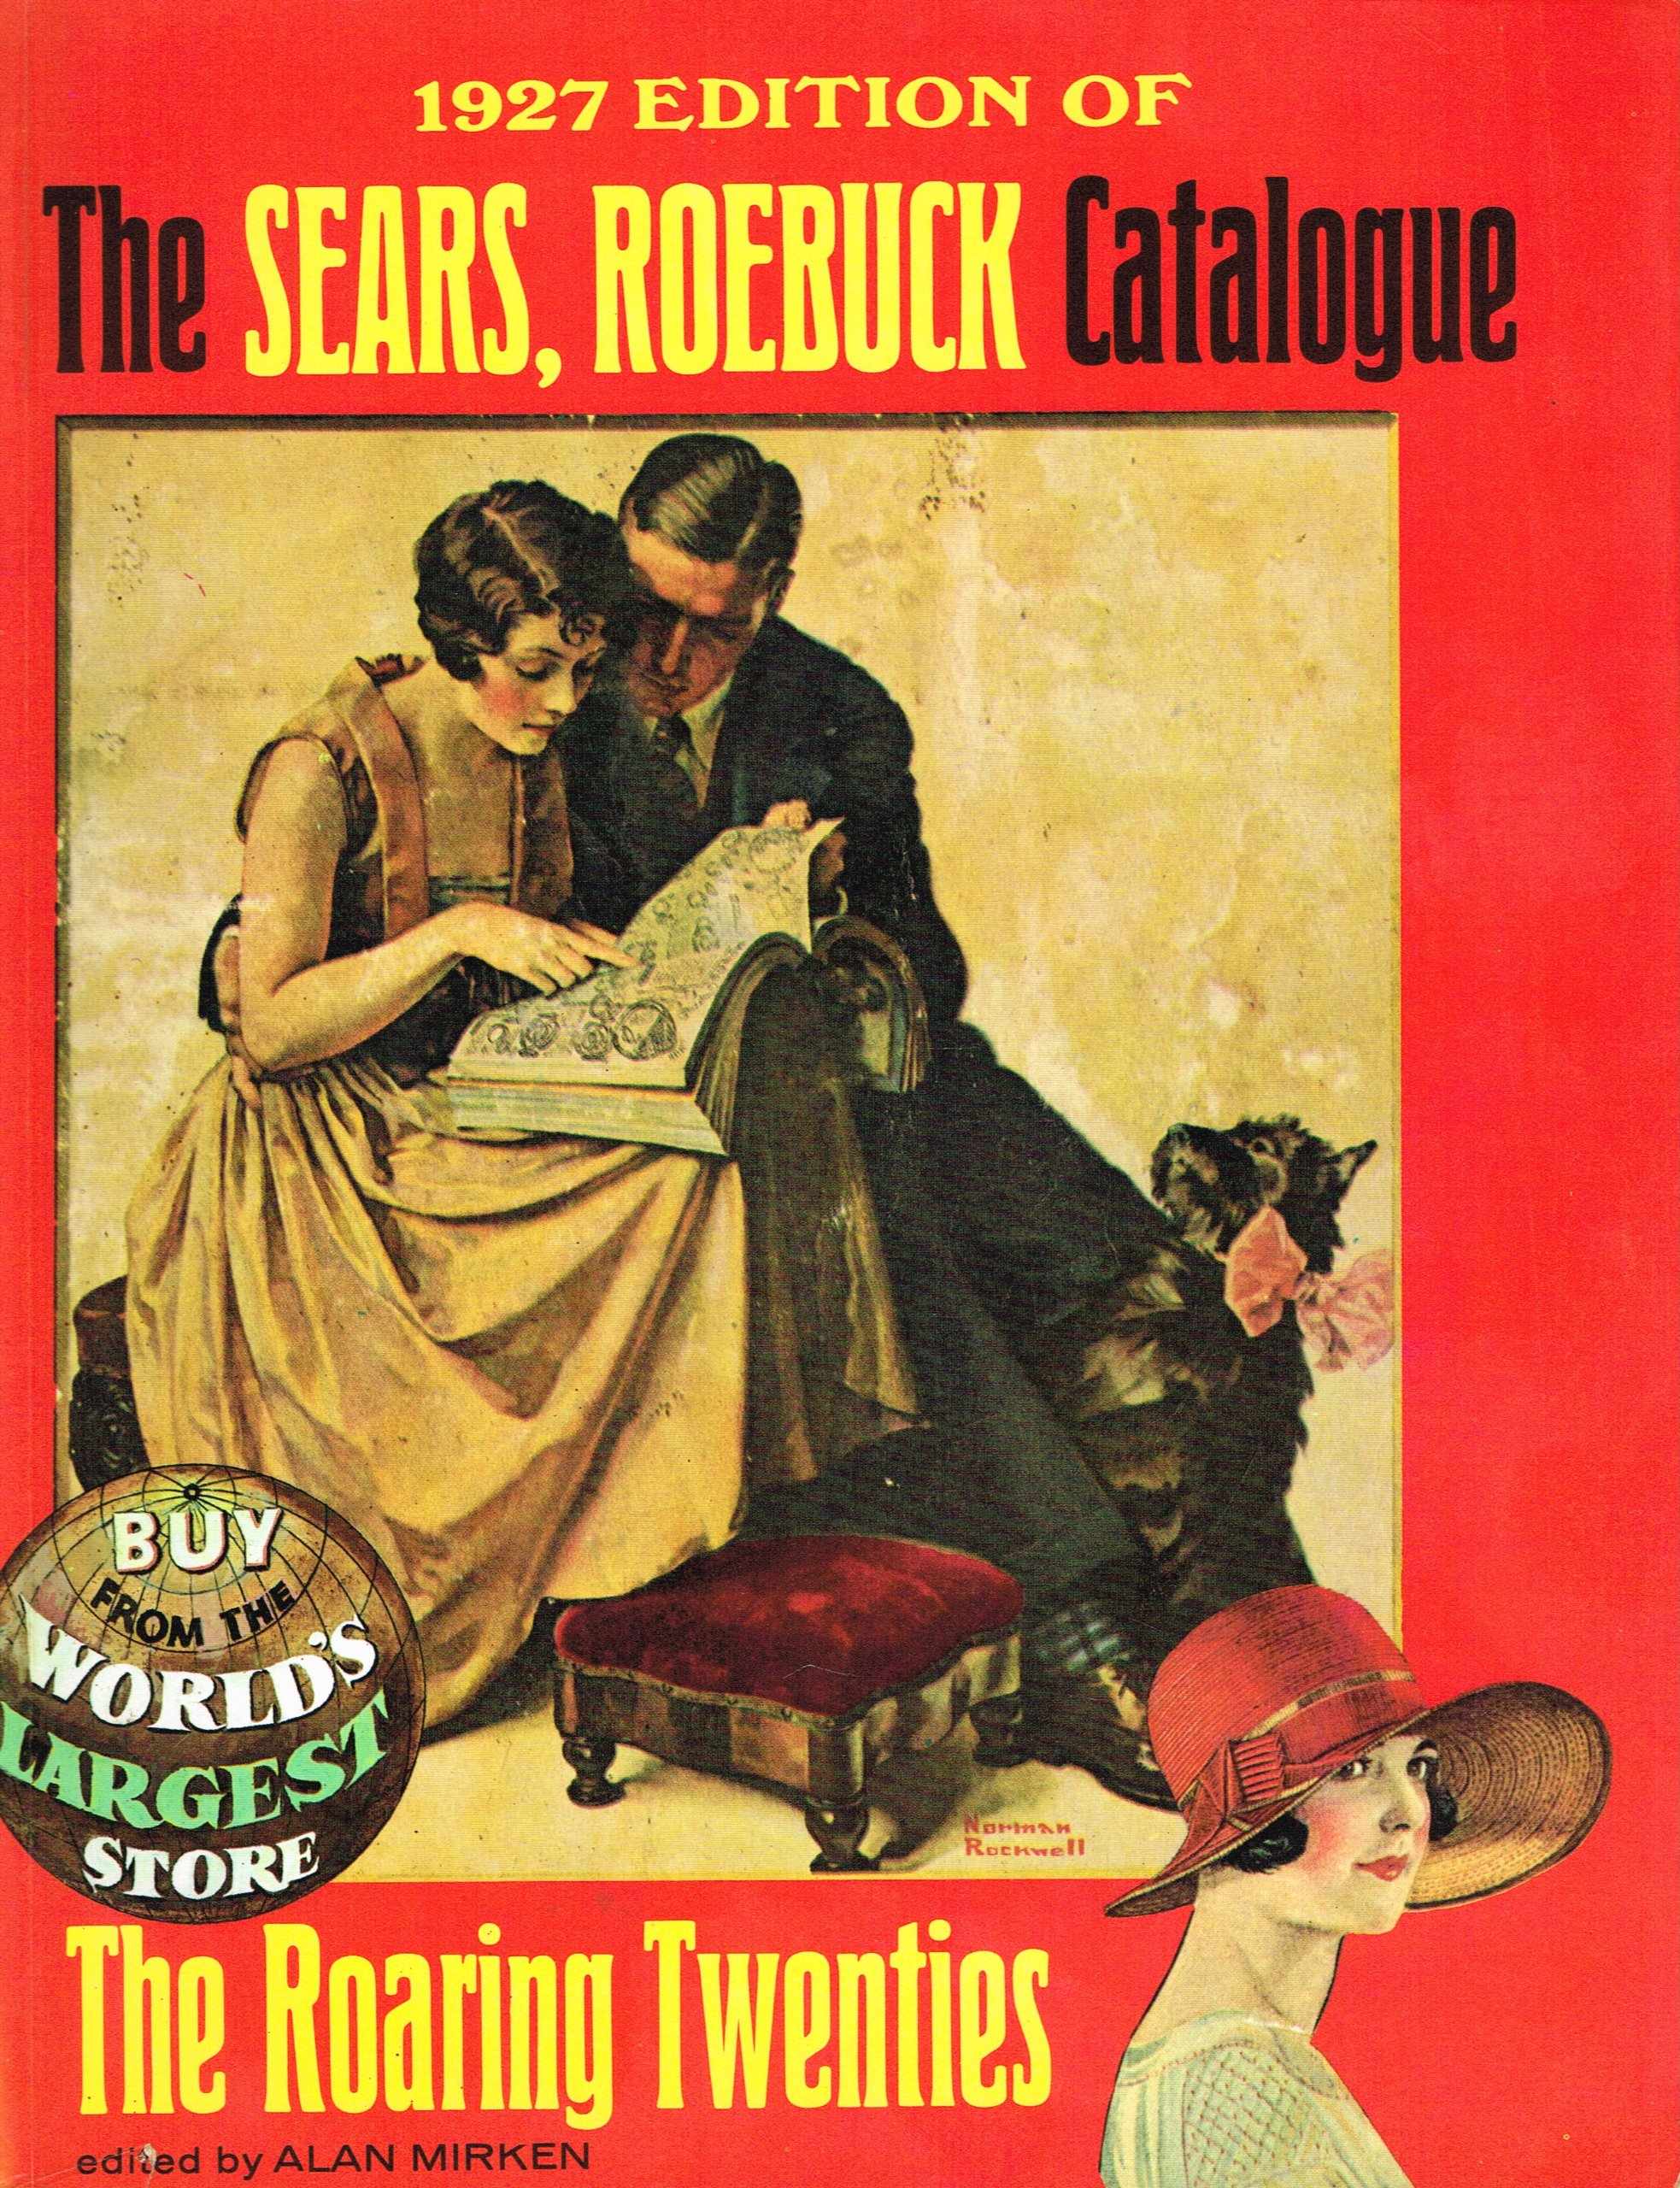 f4b718d937 1927 Edition of the Sears Roebuck Catalogue  roebuck sears  Amazon ...